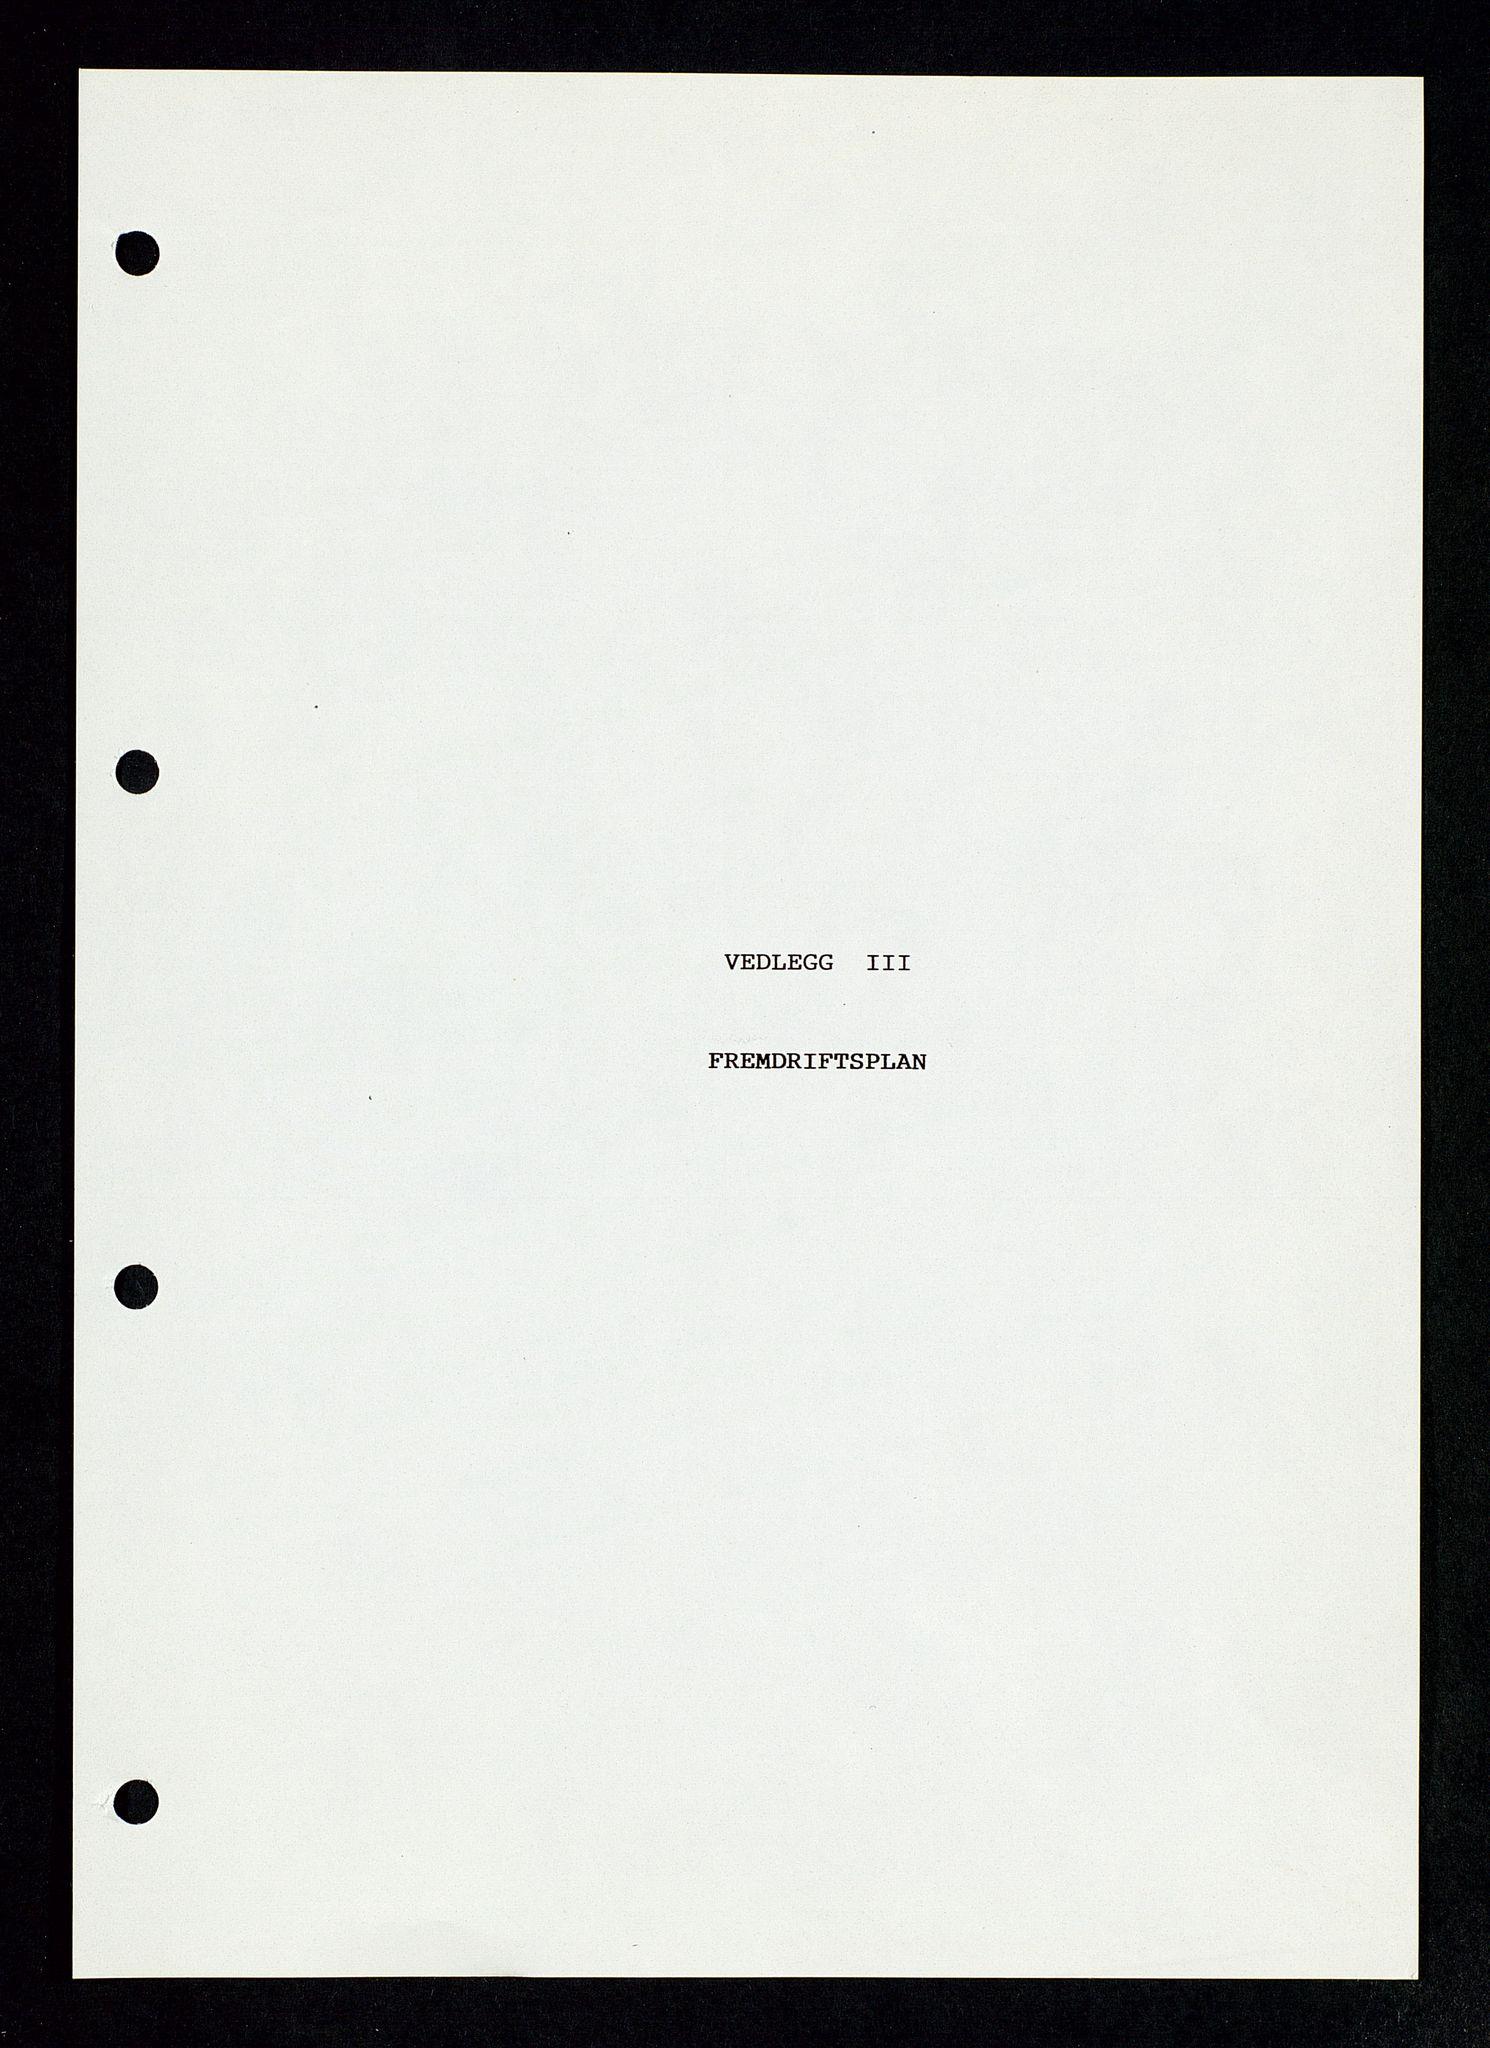 SAST, Pa 1339 - Statoil ASA, D/Dm/L0123: Rapporter, 1985-1988, s. 91